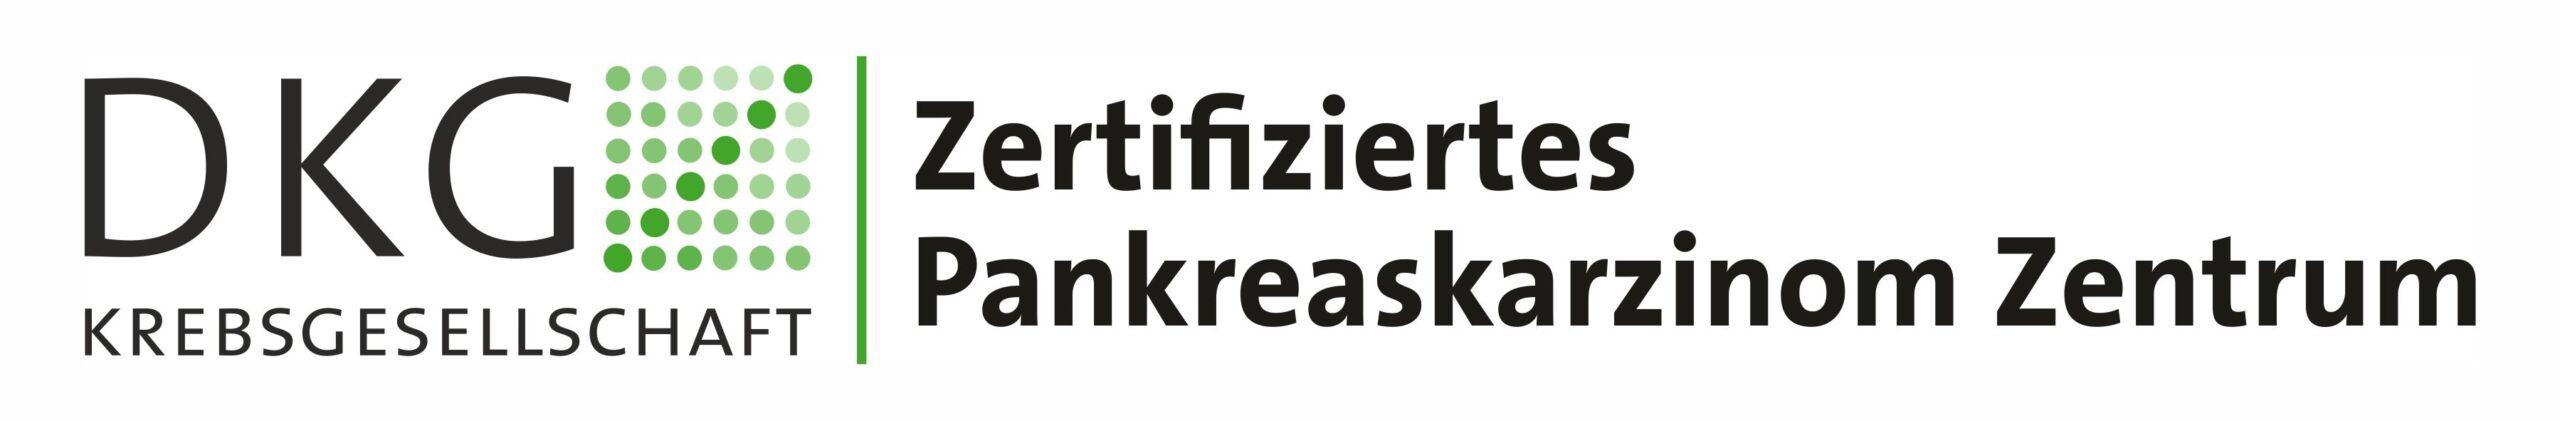 Offizielles Abzeichen der DKG Krebsgesellschaft: Zertifiziertes Pankreaskarzinom Zentrum